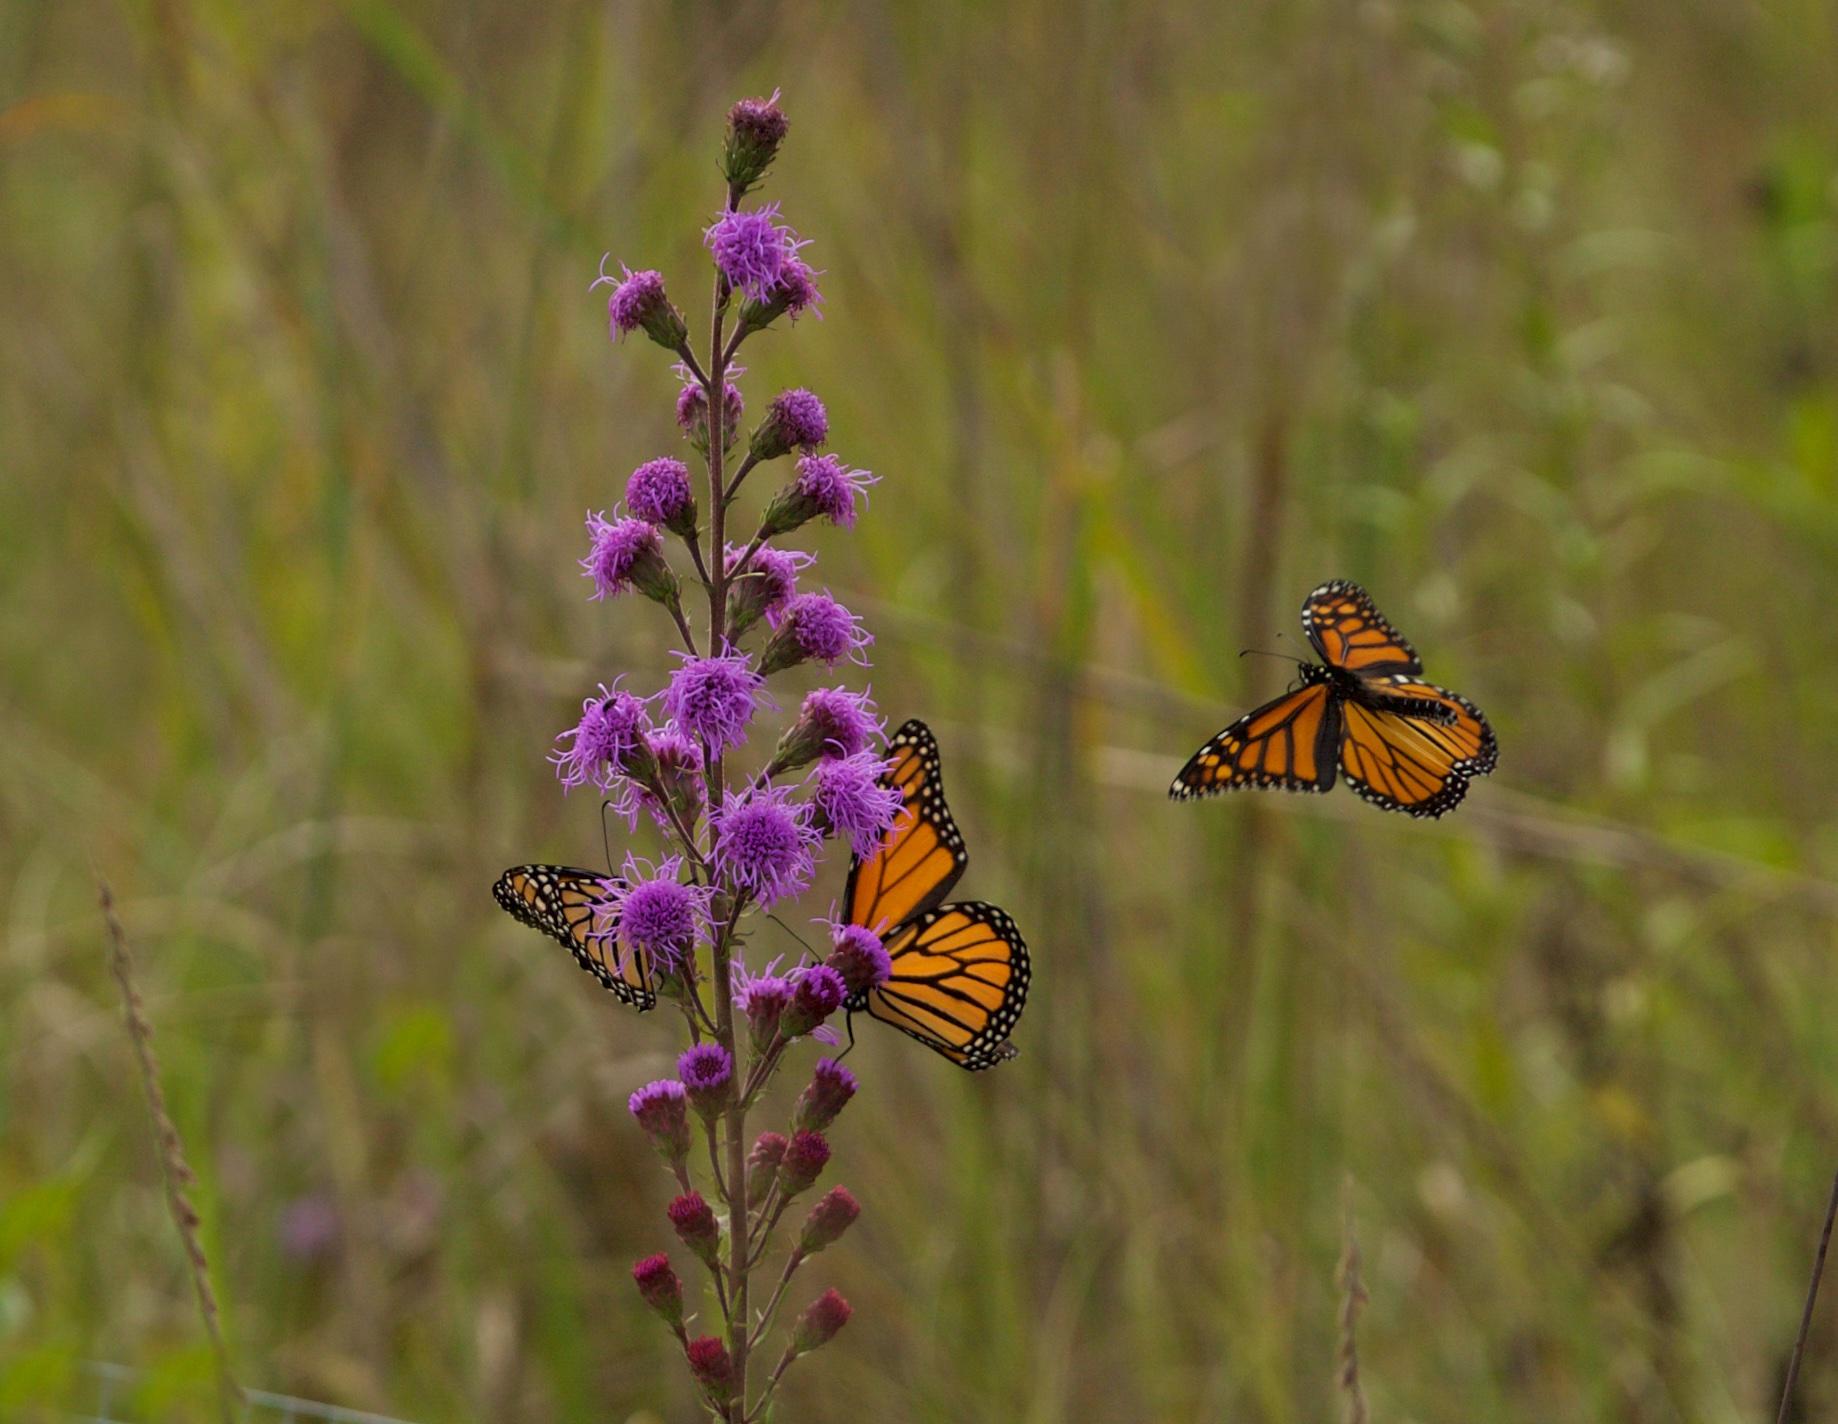 Monarchs nectaring on liatris. Photo by Arlene Koziol